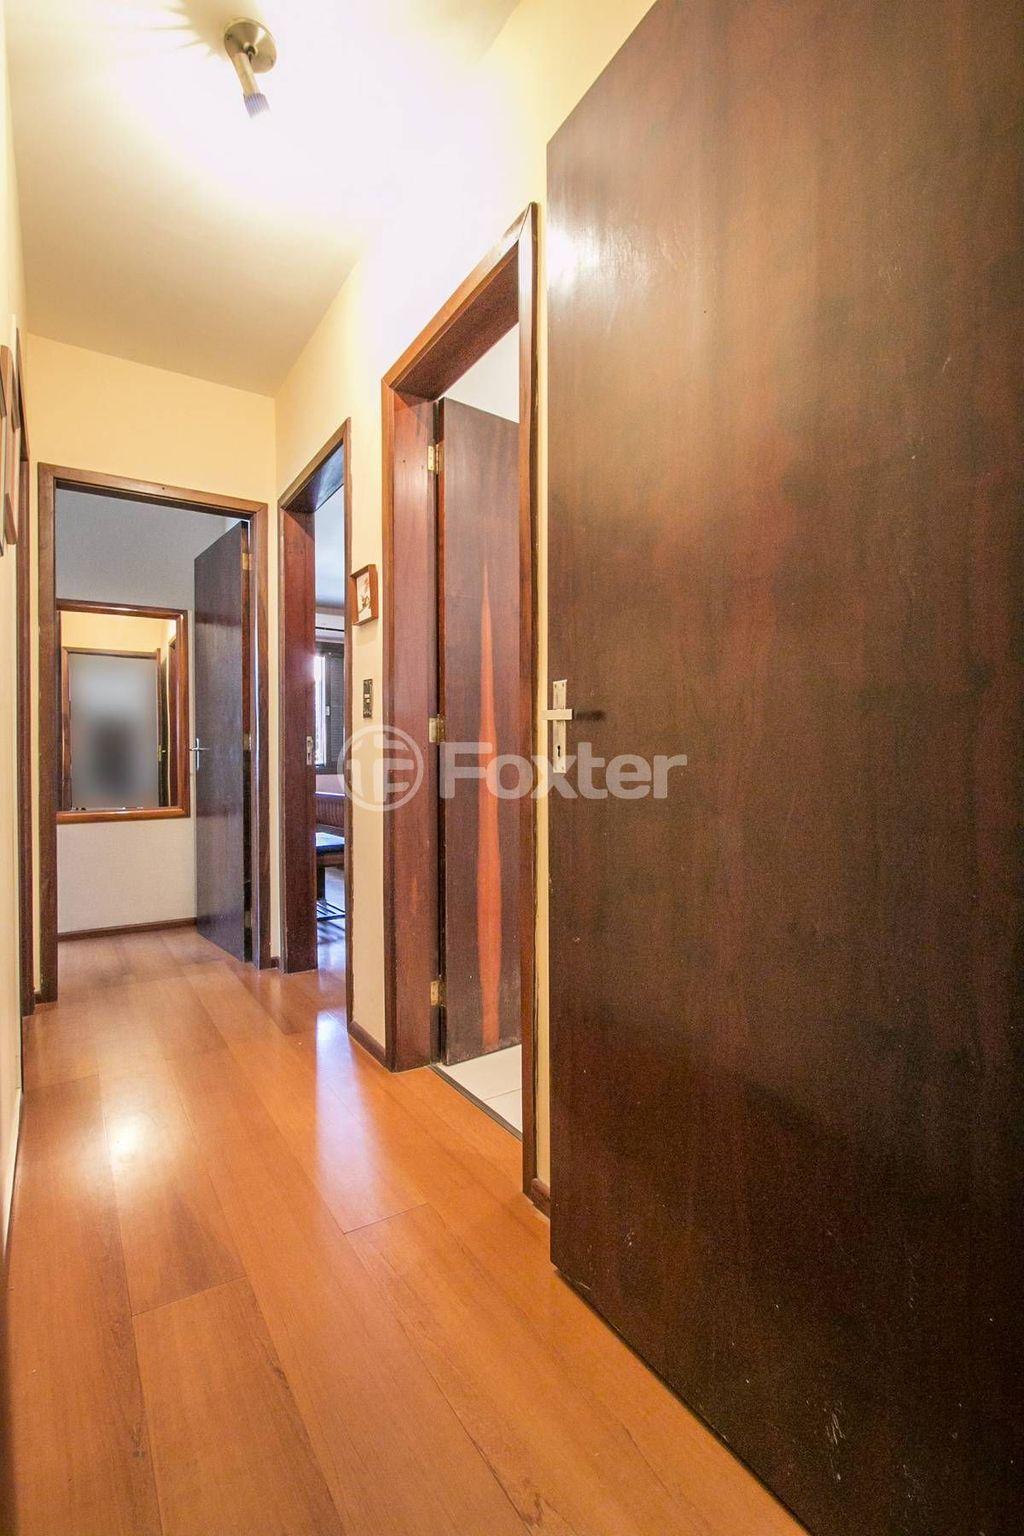 Casa 3 Dorm, Aberta dos Morros, Porto Alegre (112432) - Foto 5